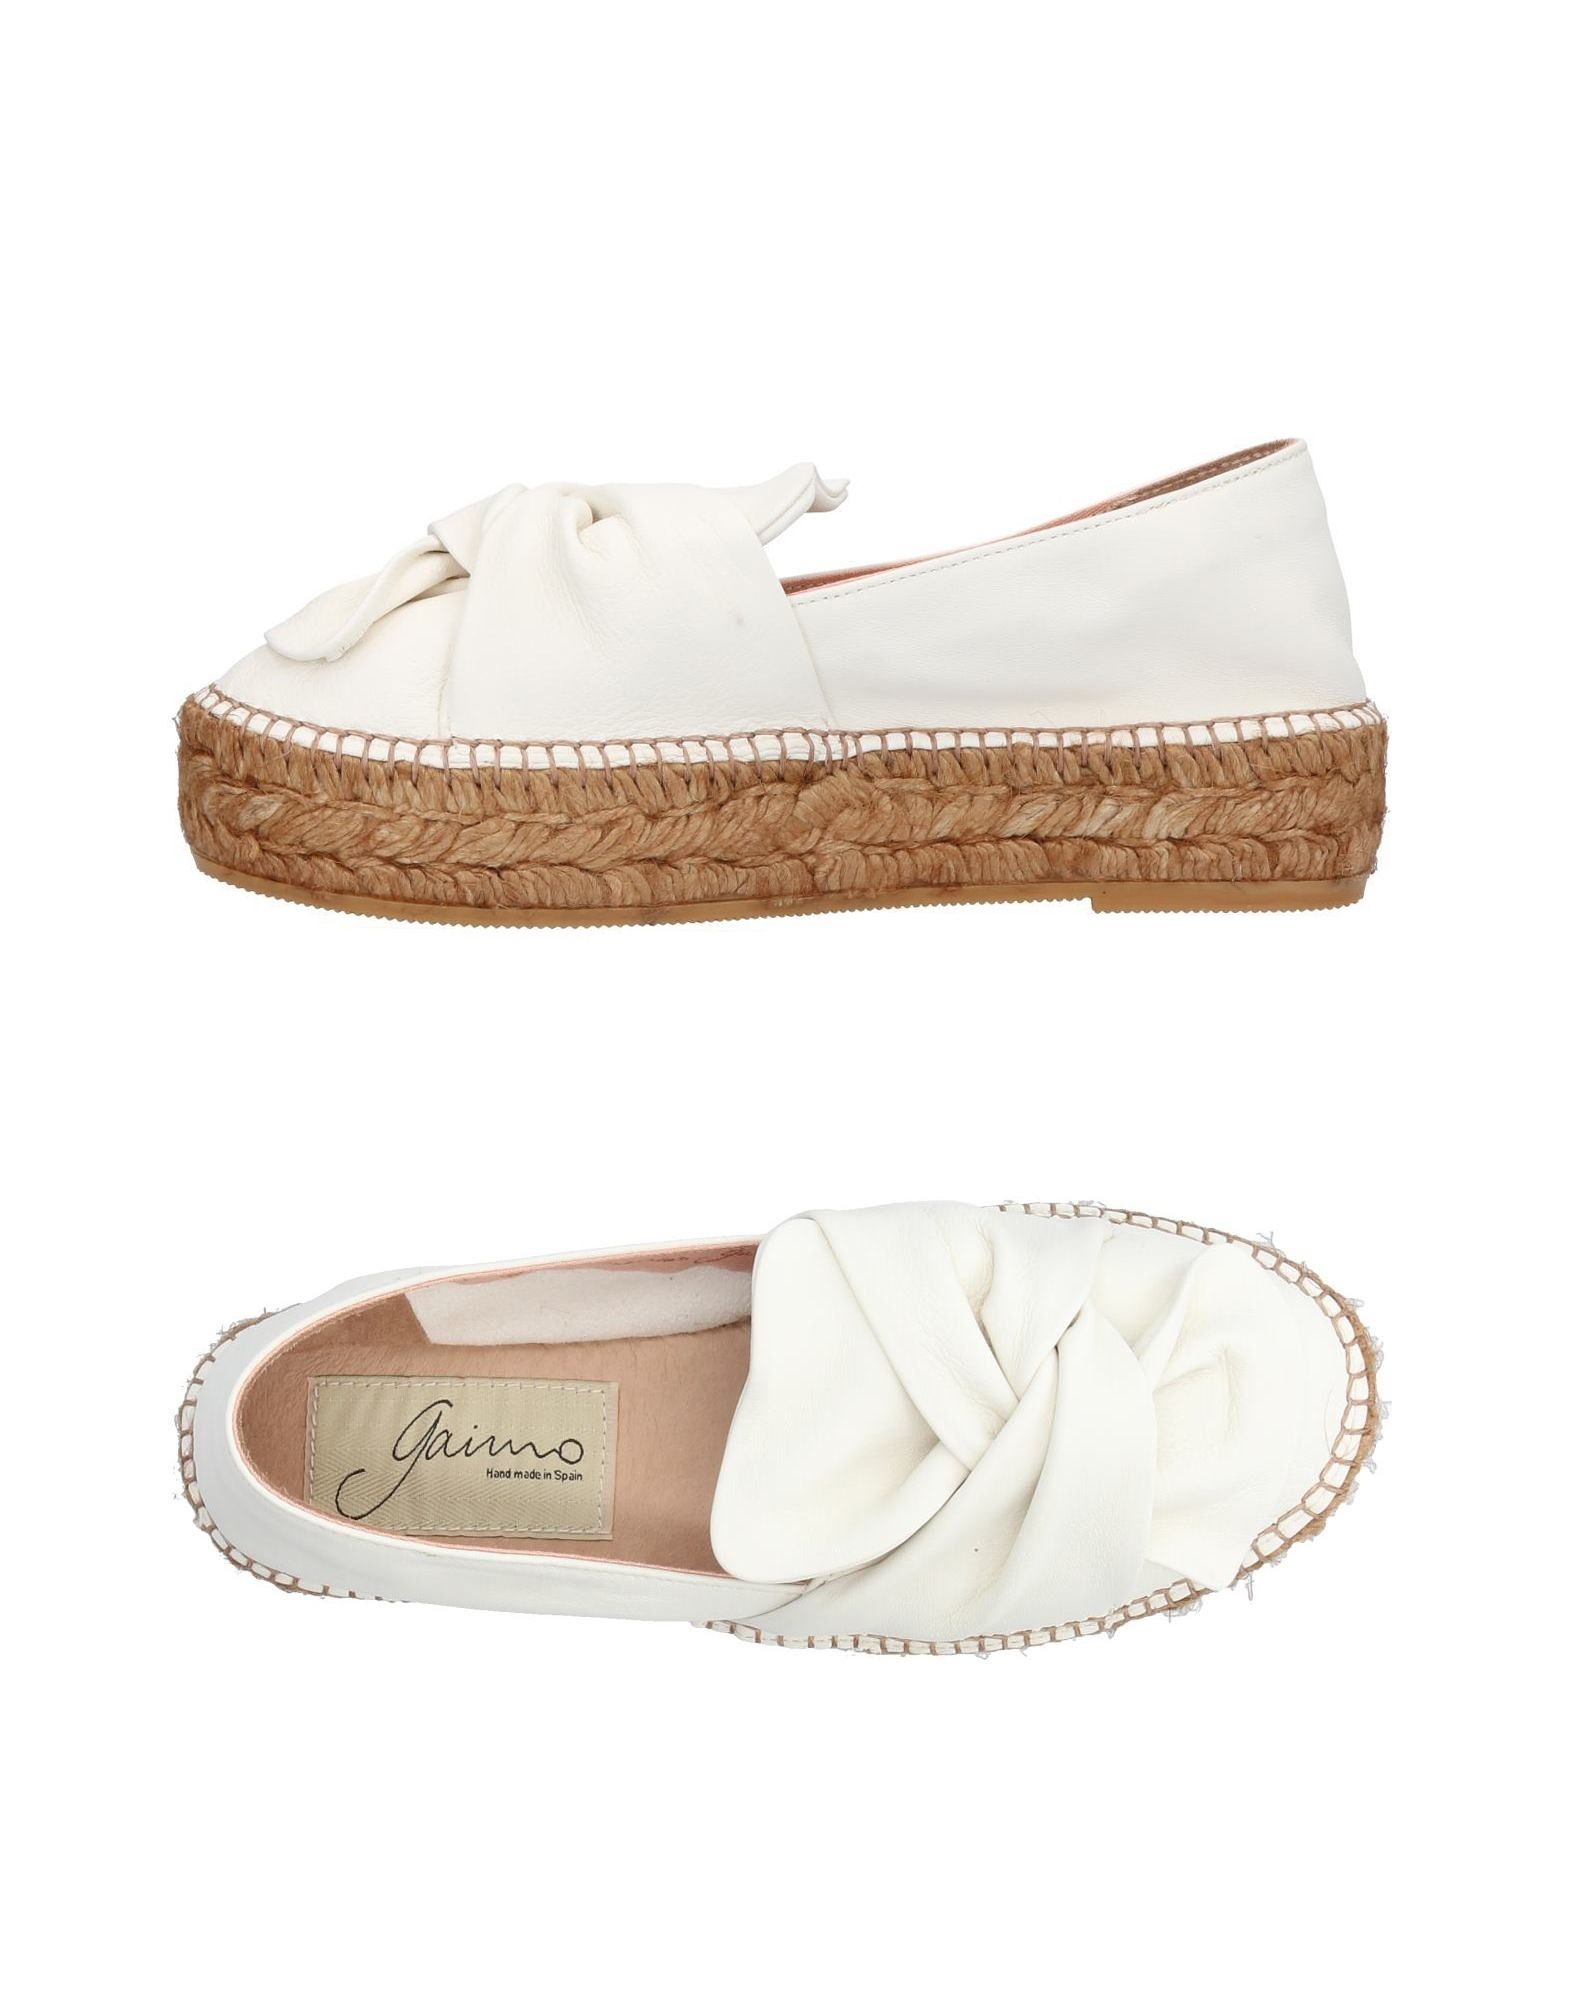 Gaimo Espadrilles Damen  11380711MI Gute Qualität beliebte Schuhe